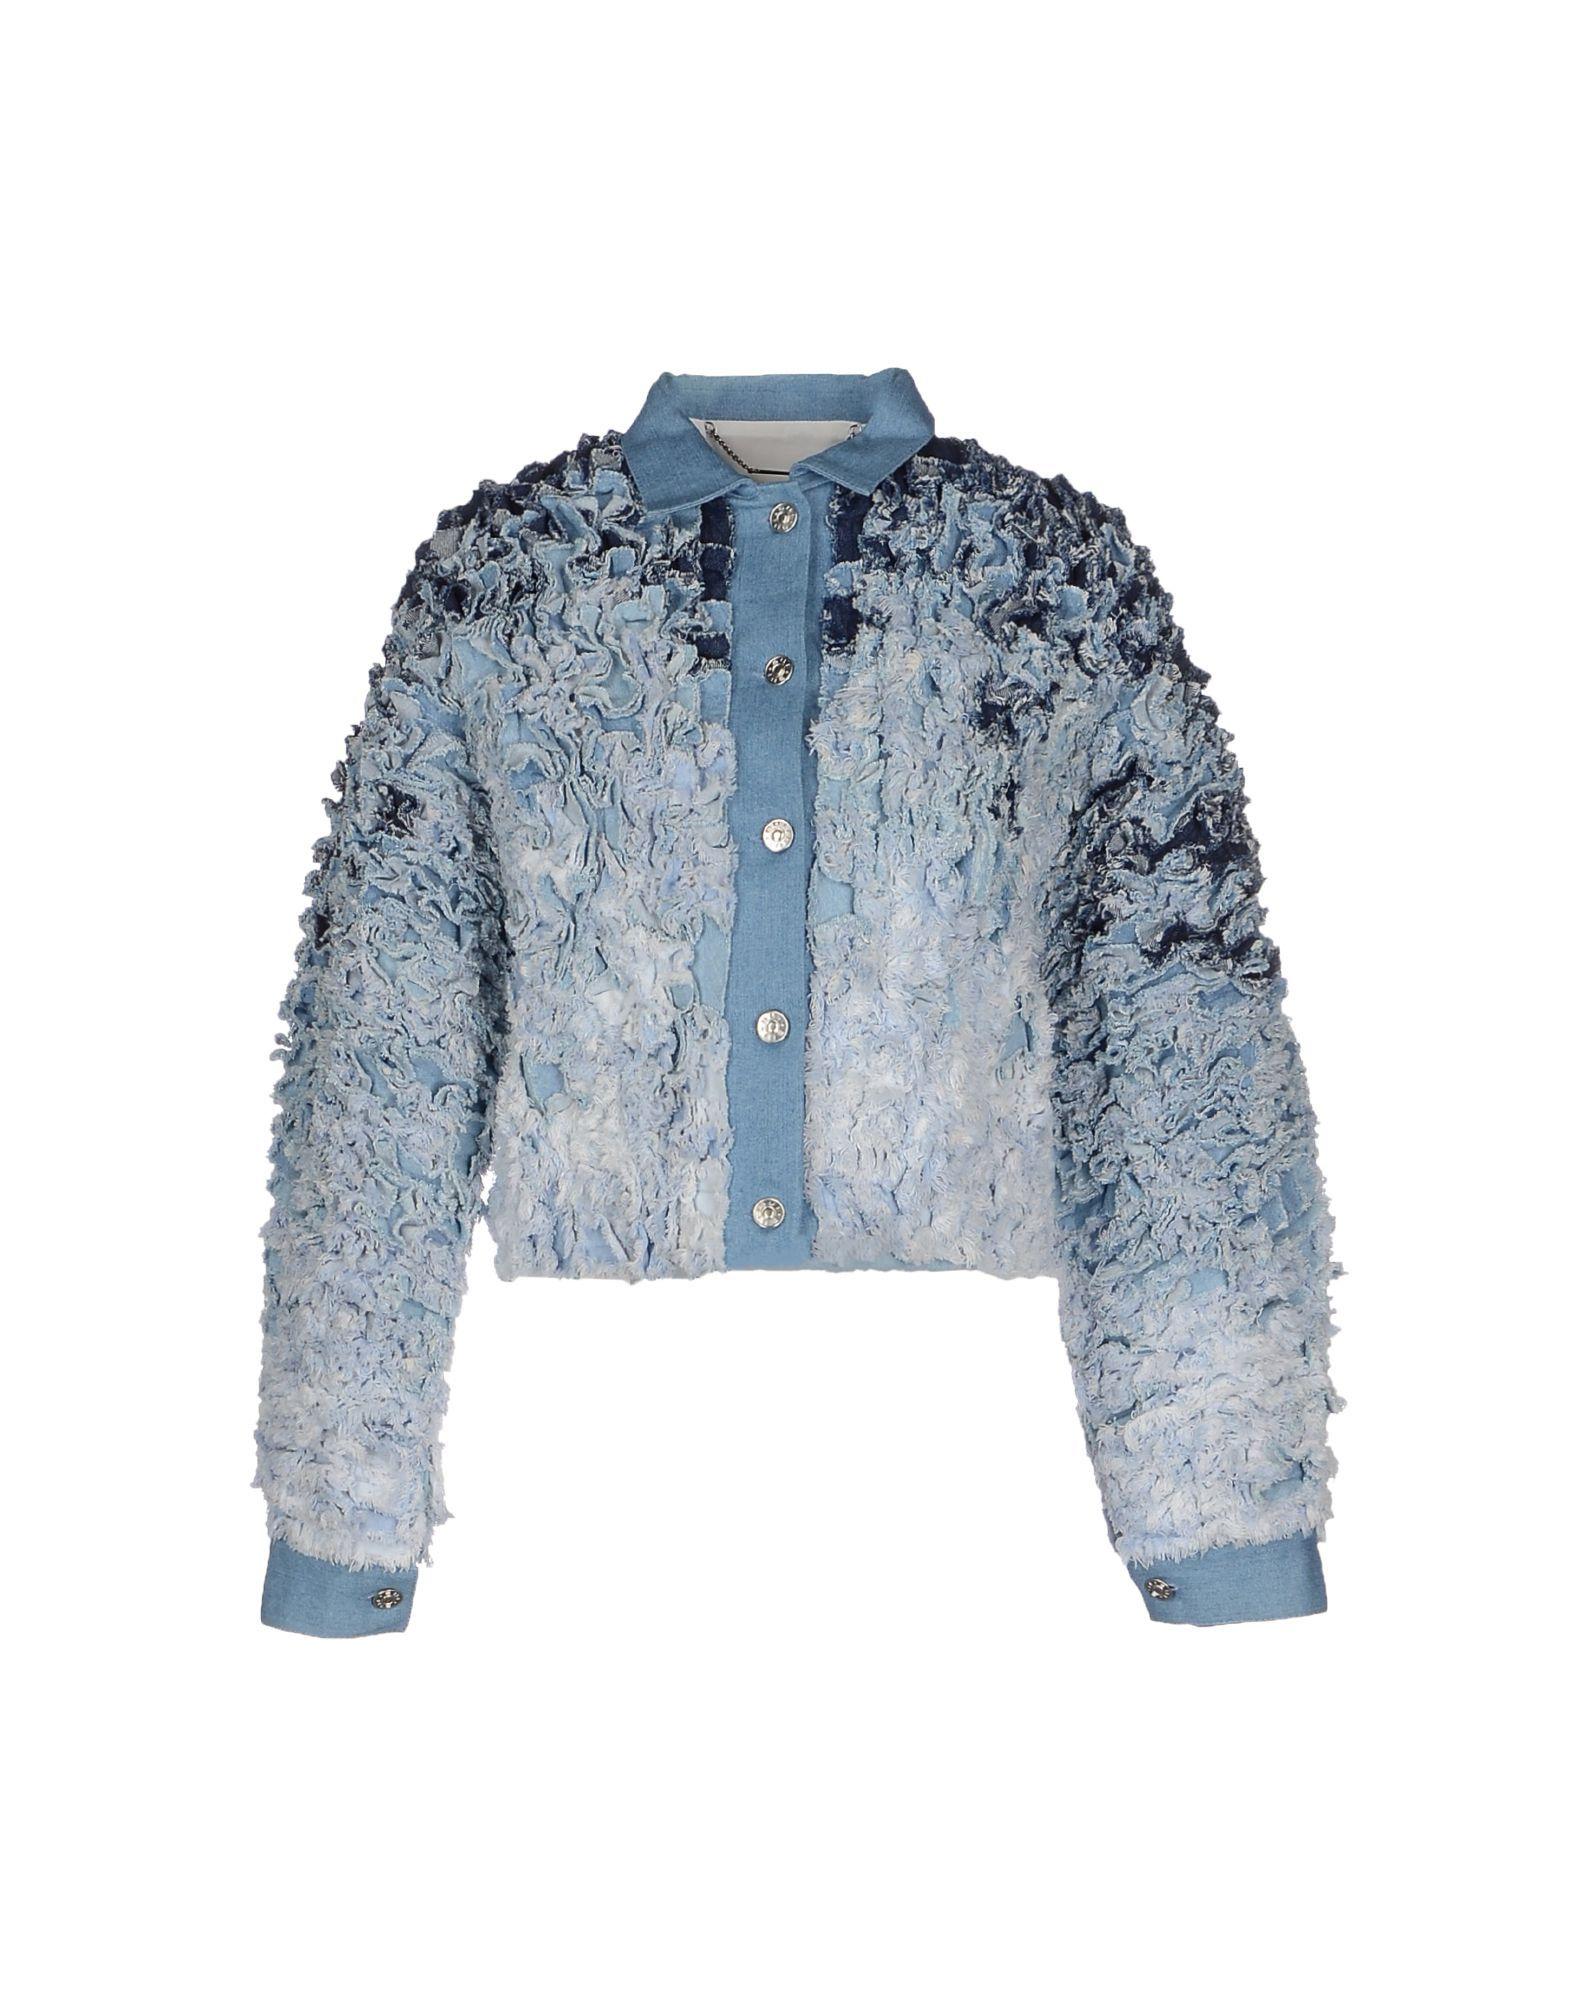 Shop this BARBARA BUI Denim jacket > http://yoox.ly/1H2XFN1